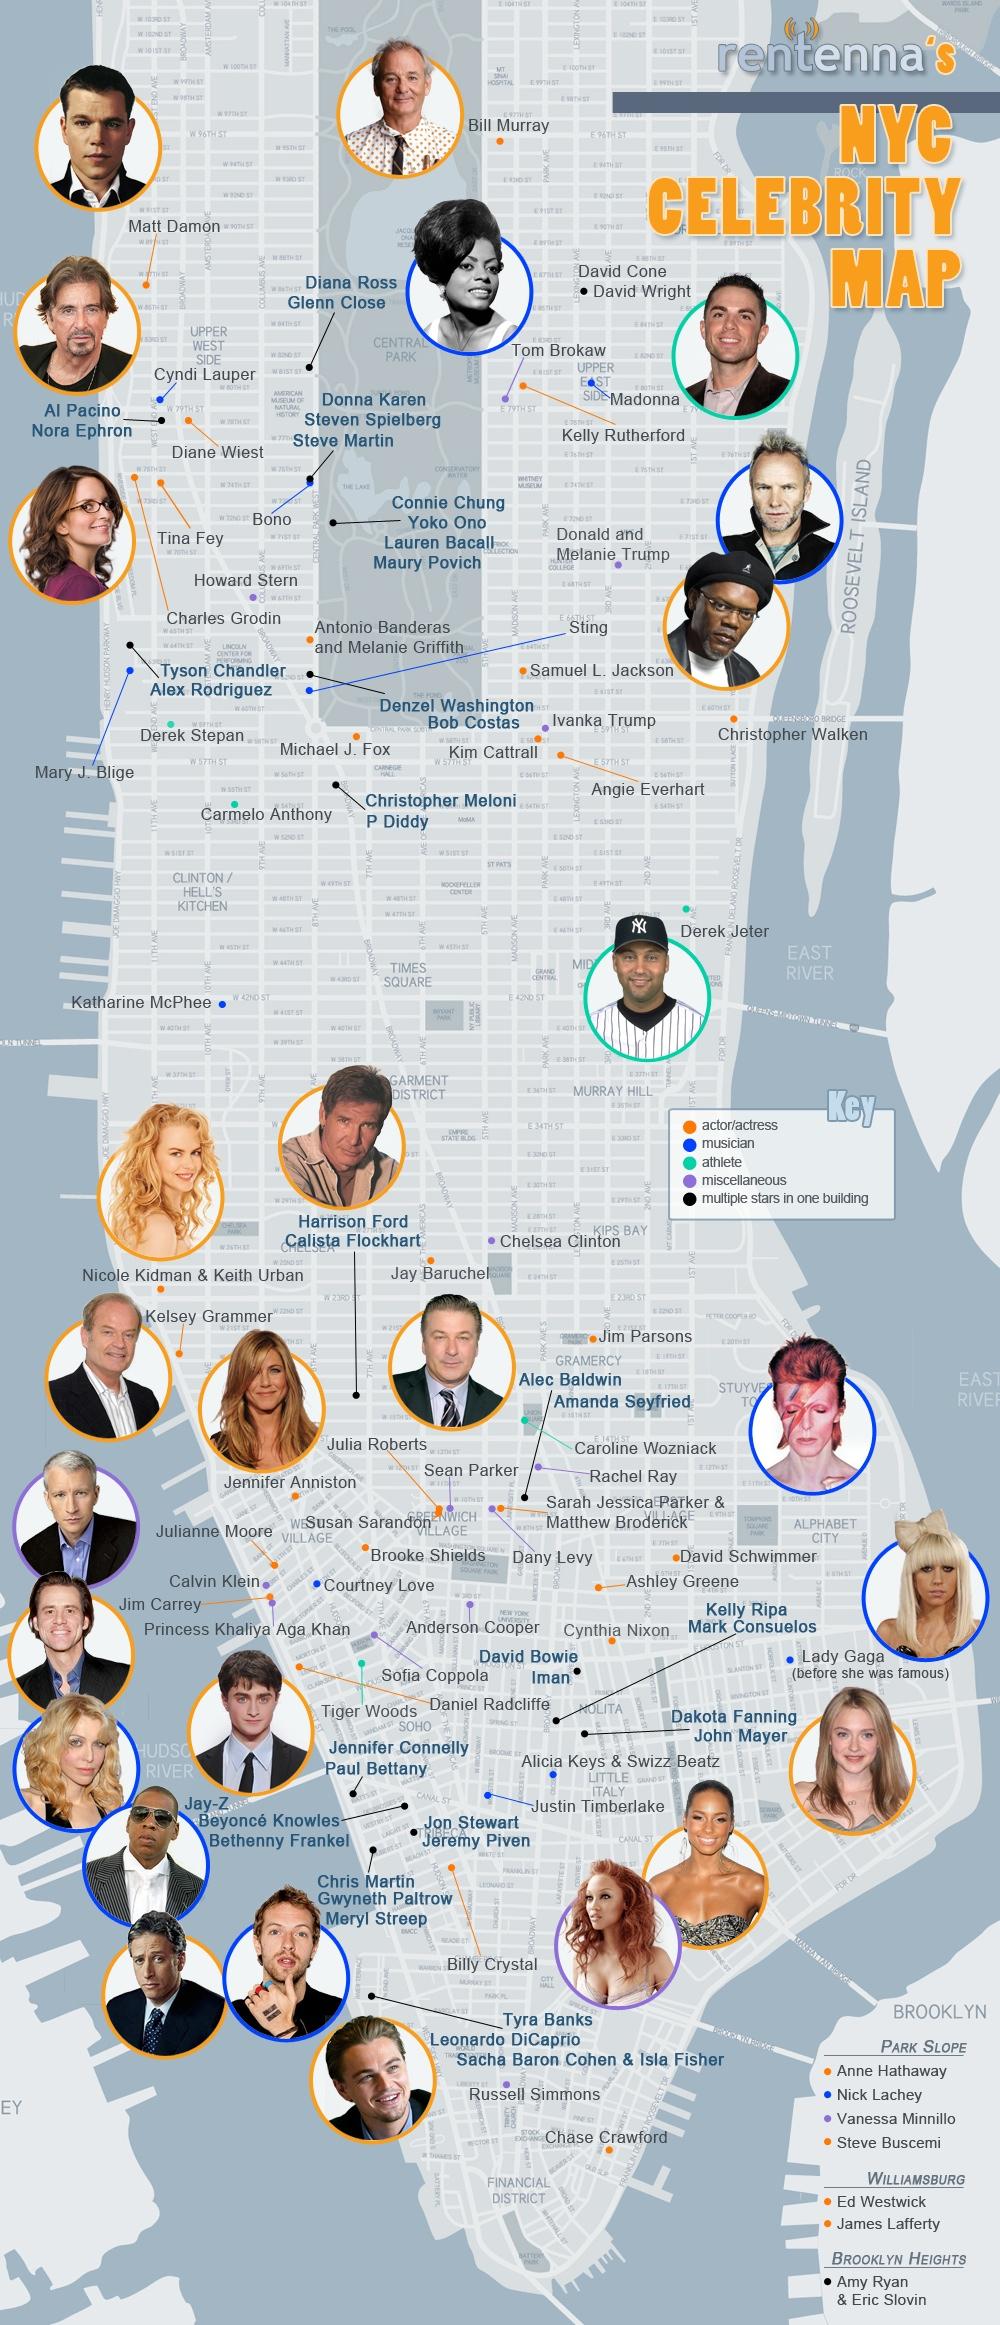 Born in New York | Famous Birthdays